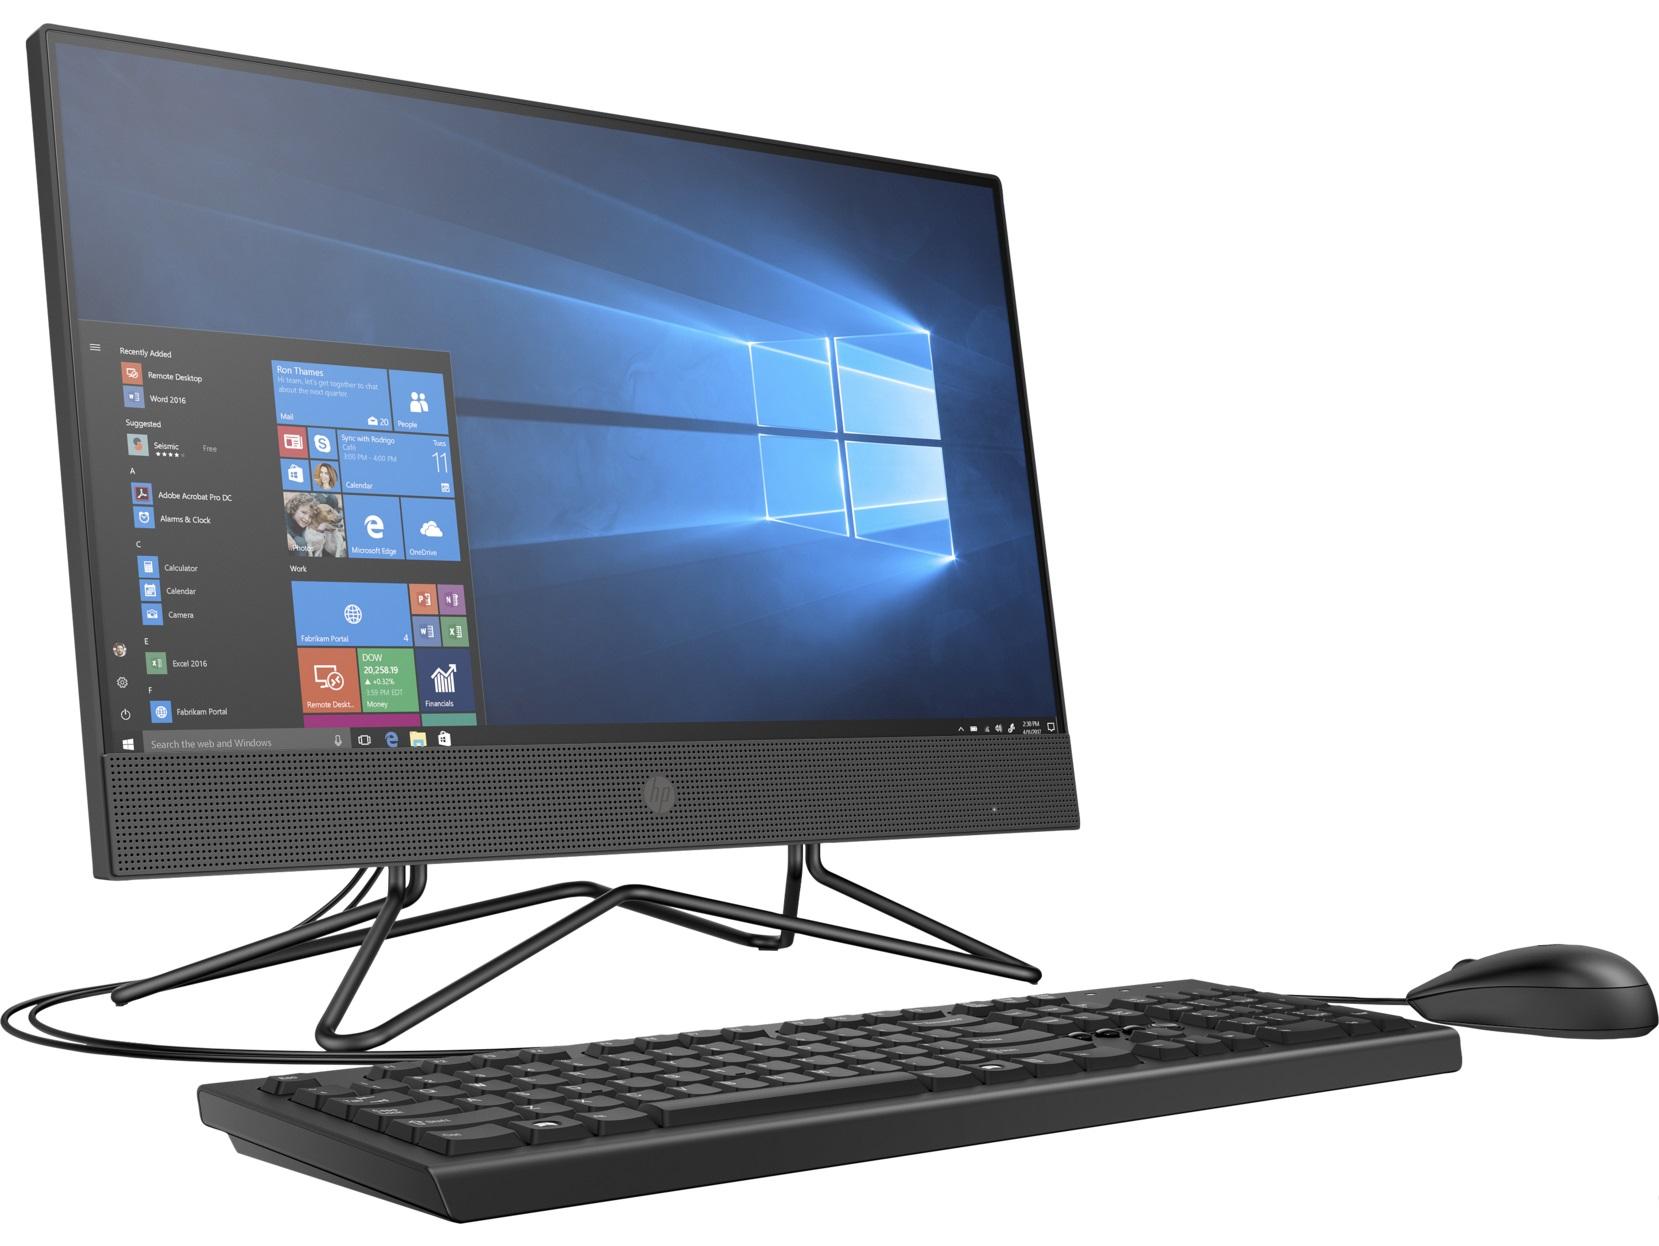 "All-in-One PC - 21.5"" HP 200 G4 FHD IPS, Intel® Core® i3-10110U, 4GB DDR4 RAM, 1TB HDD, Intel® HD 620 Graphics, DVD-RW, CR, HD cam, WiFi+BT4.2, LAN, 65W PSU, USB KB/MS, DOS, Iron Gray."